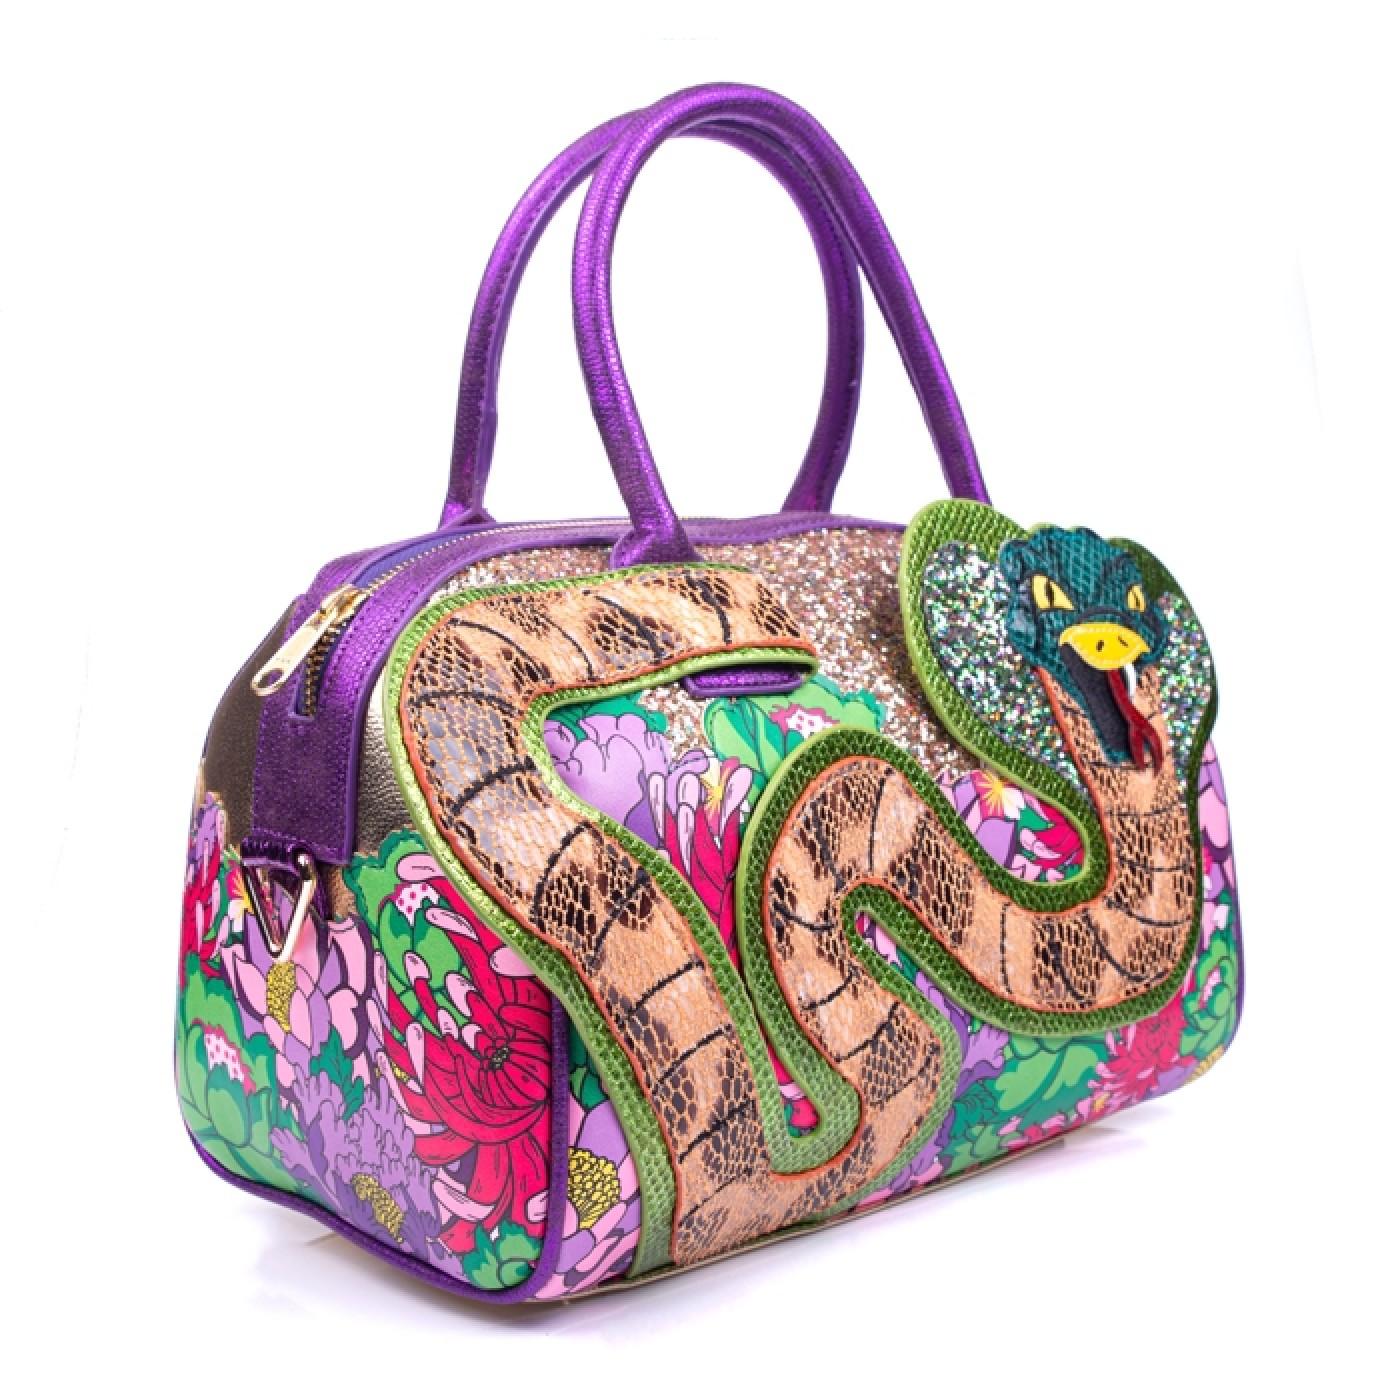 Be Charming Bag